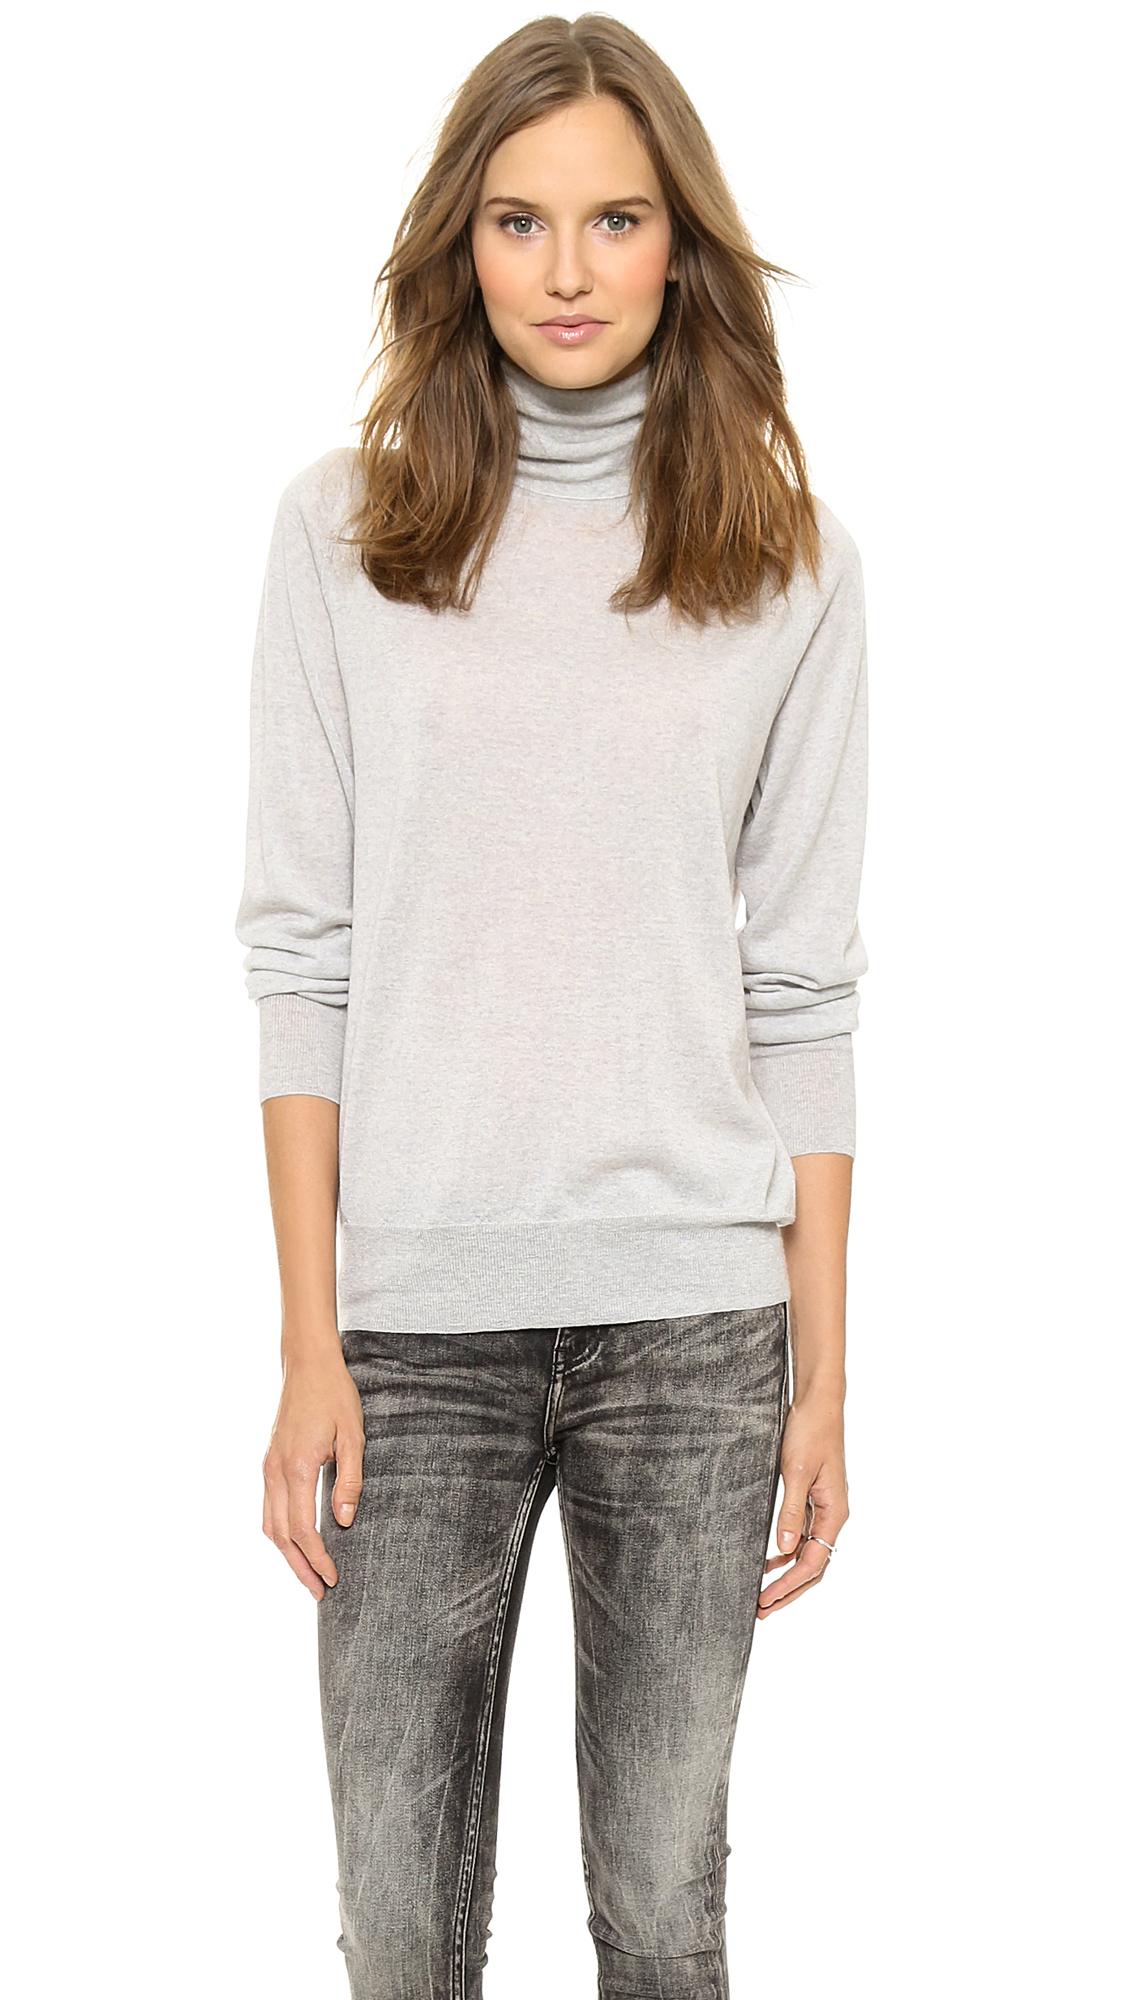 6397 Turtleneck Sweater Light Grey Heather in Gray | Lyst